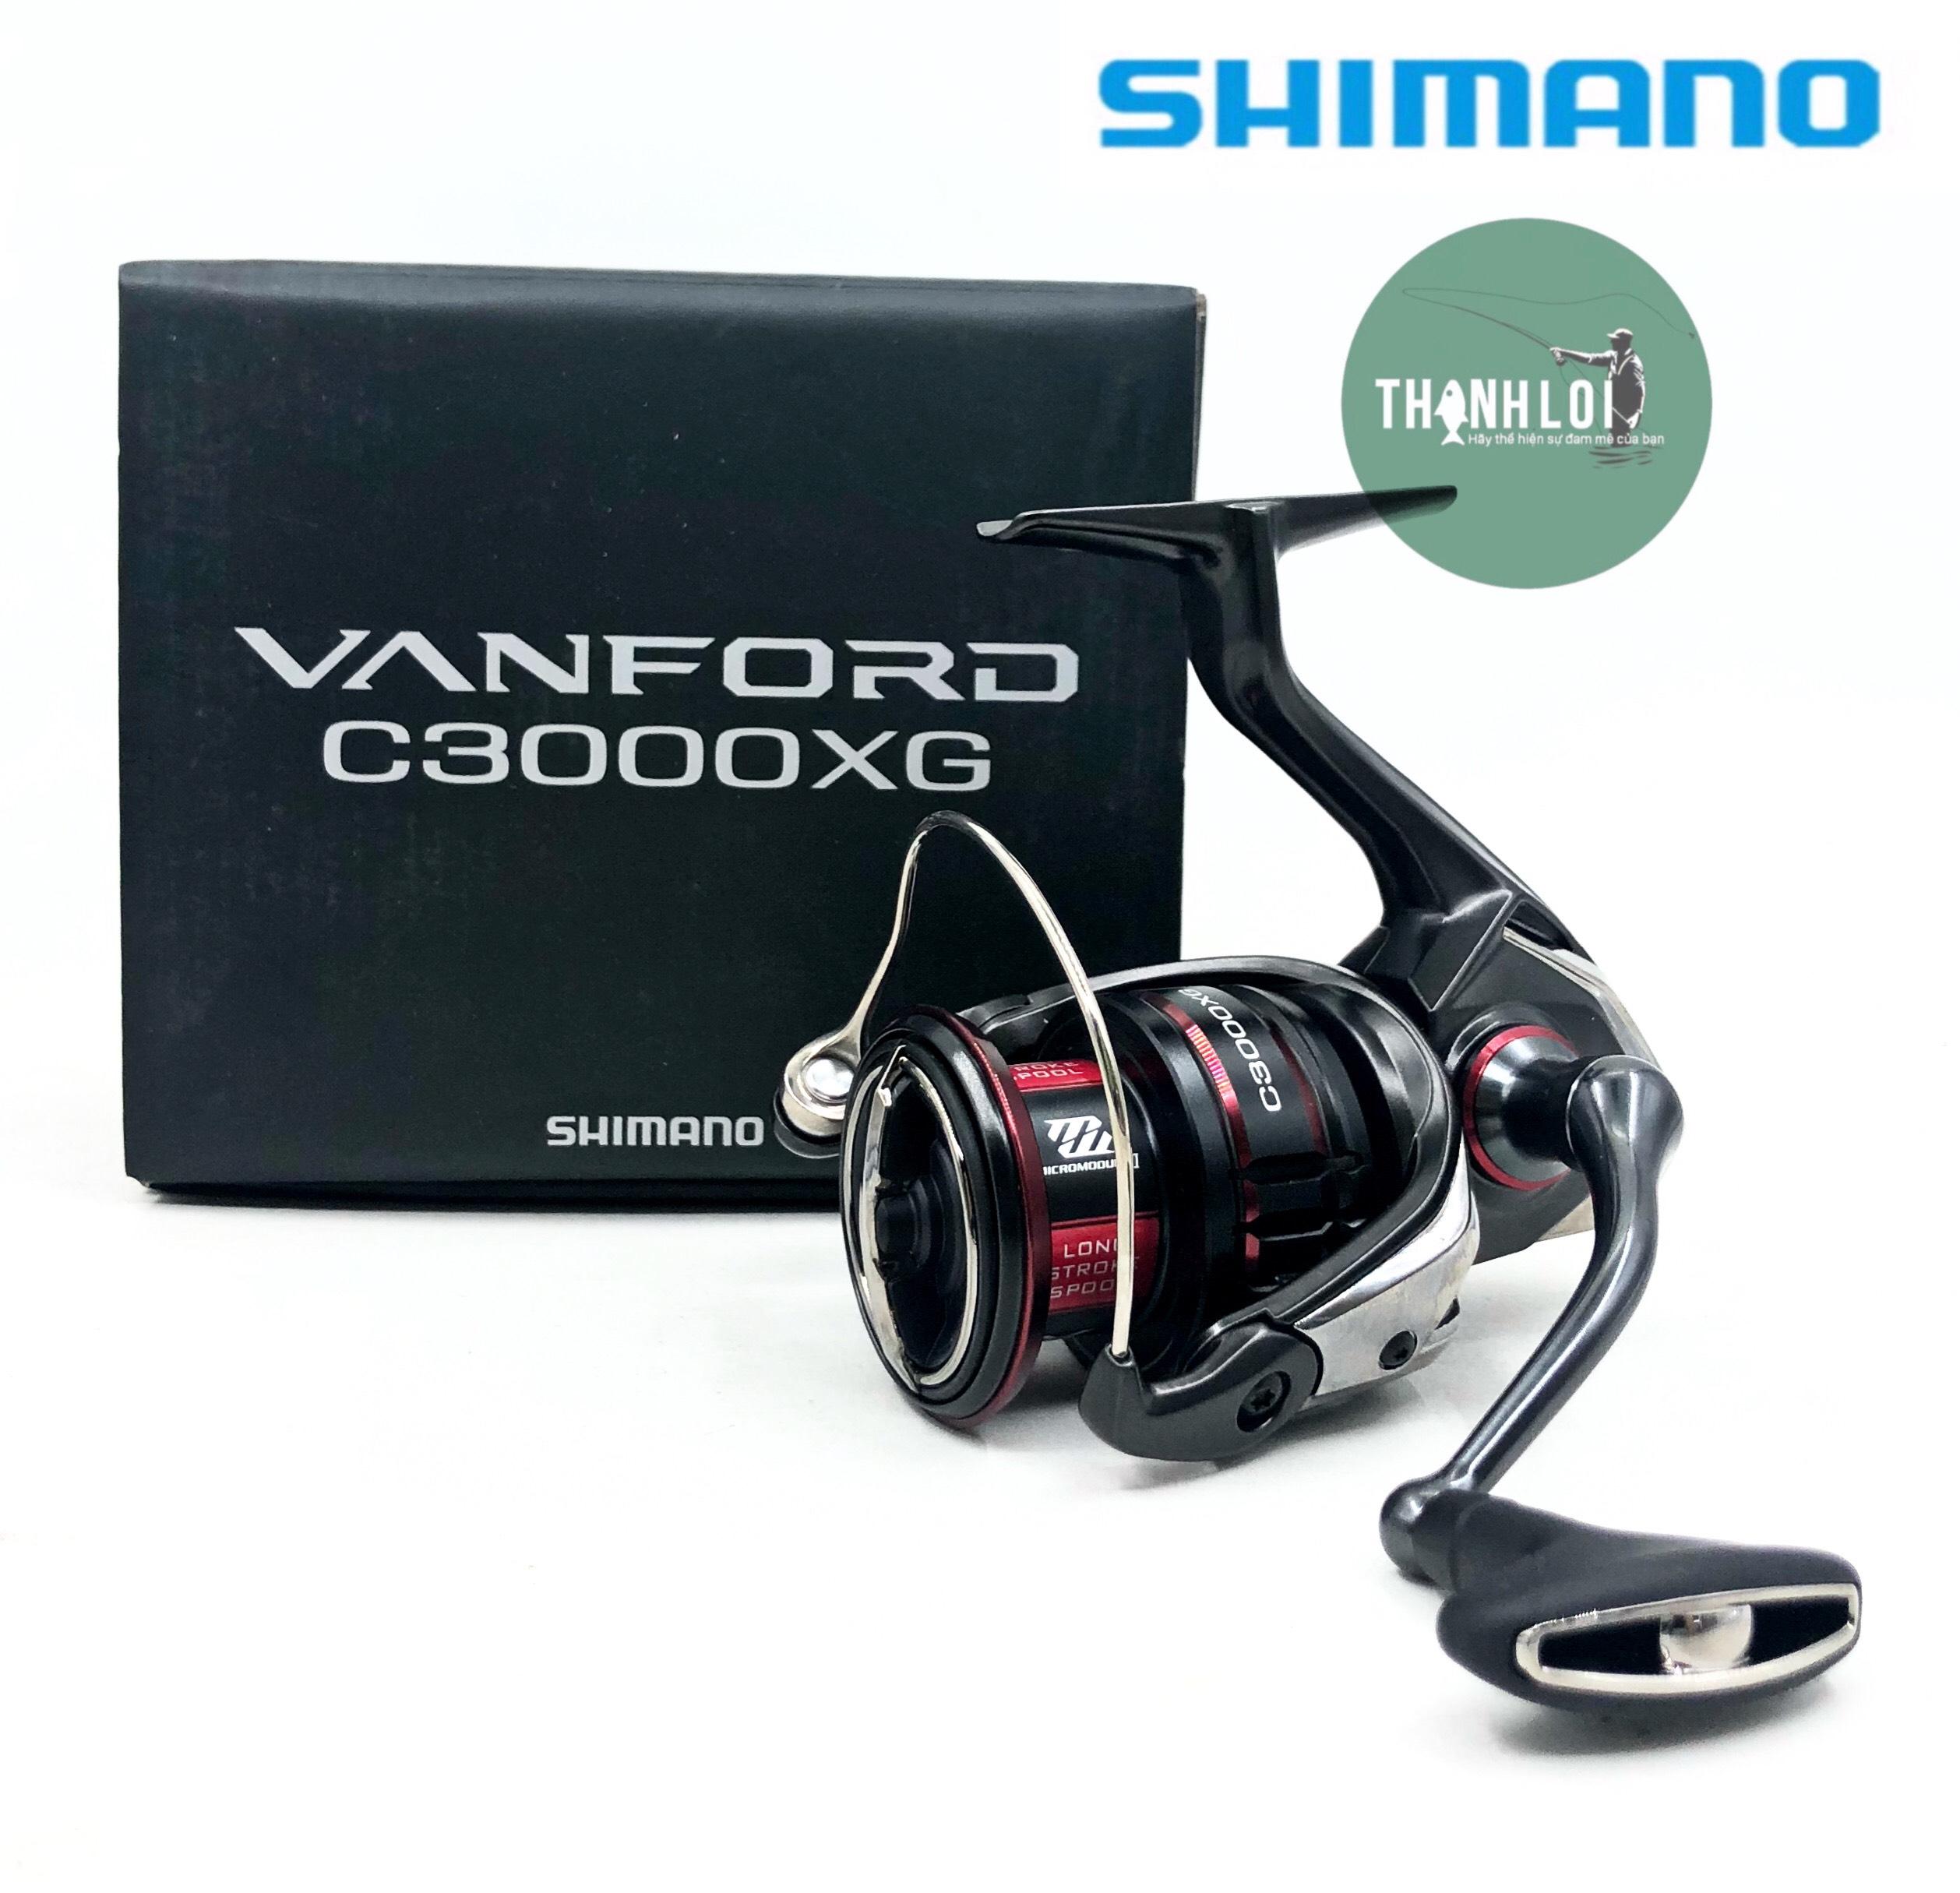 MÁY SHIMANO VANFORD C3000XG